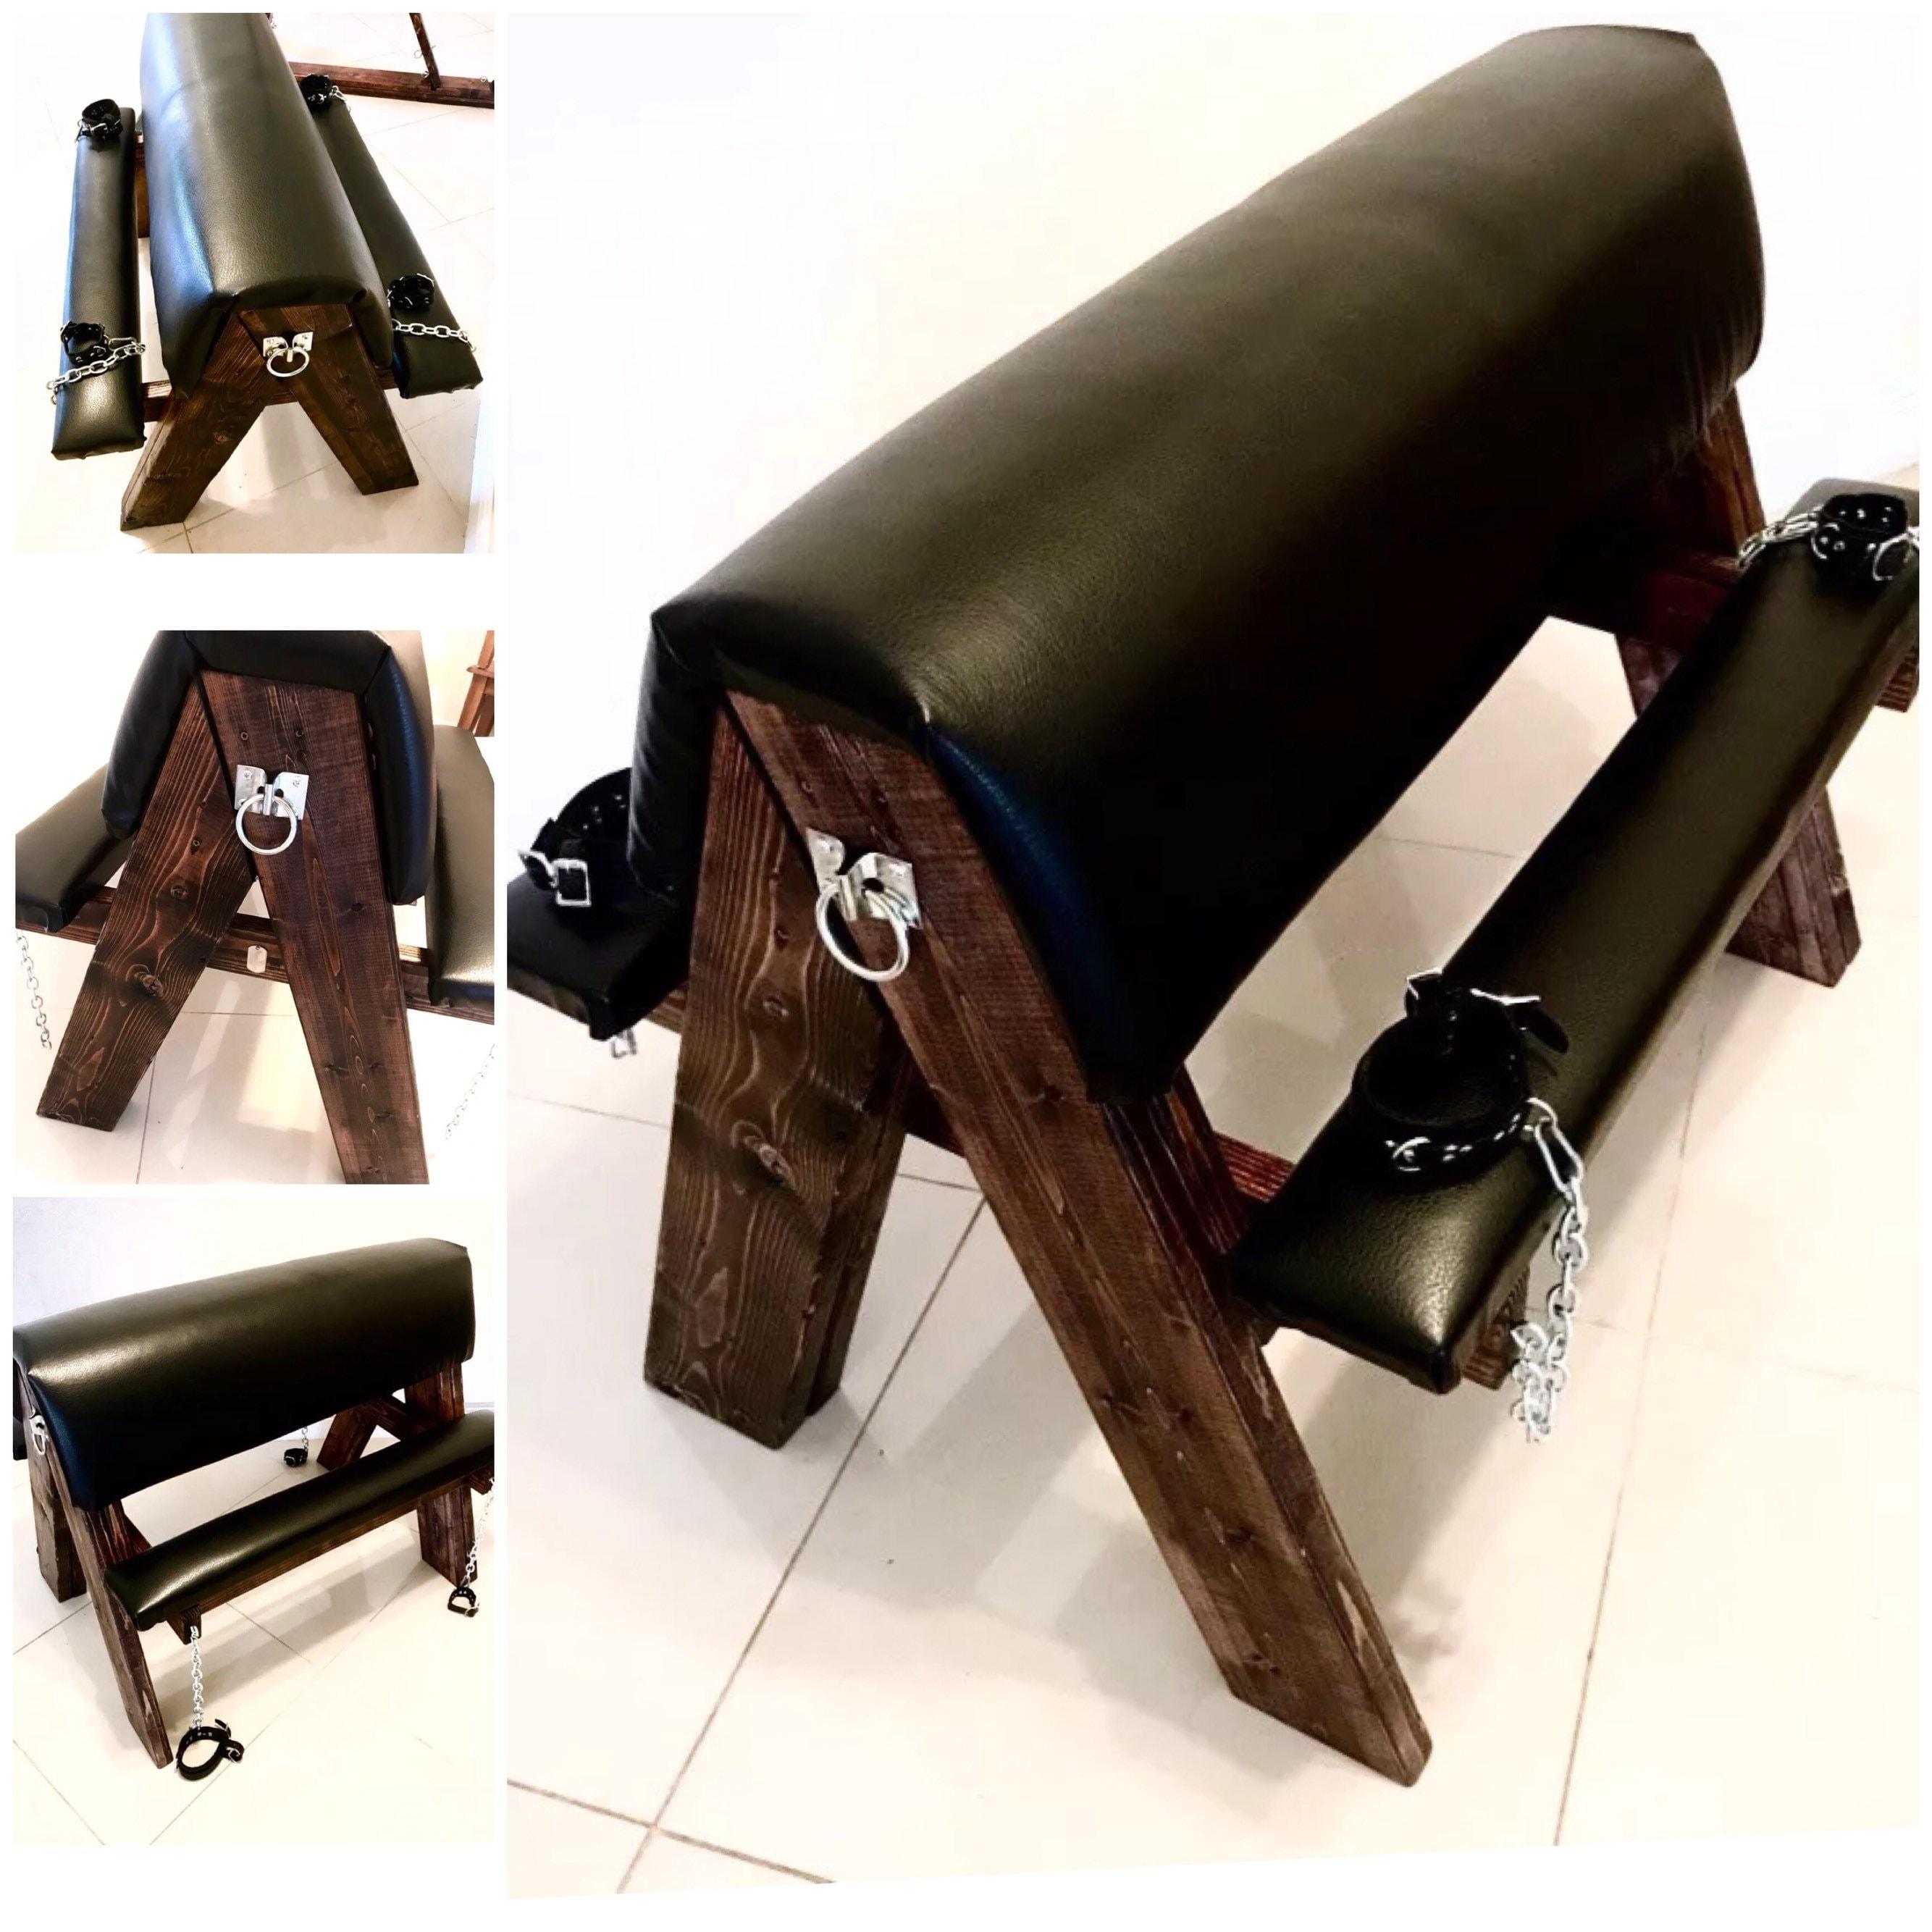 Bdsm Dungeon Furniture Upholstered Handmade Wood Spanking Horse Sex Bench